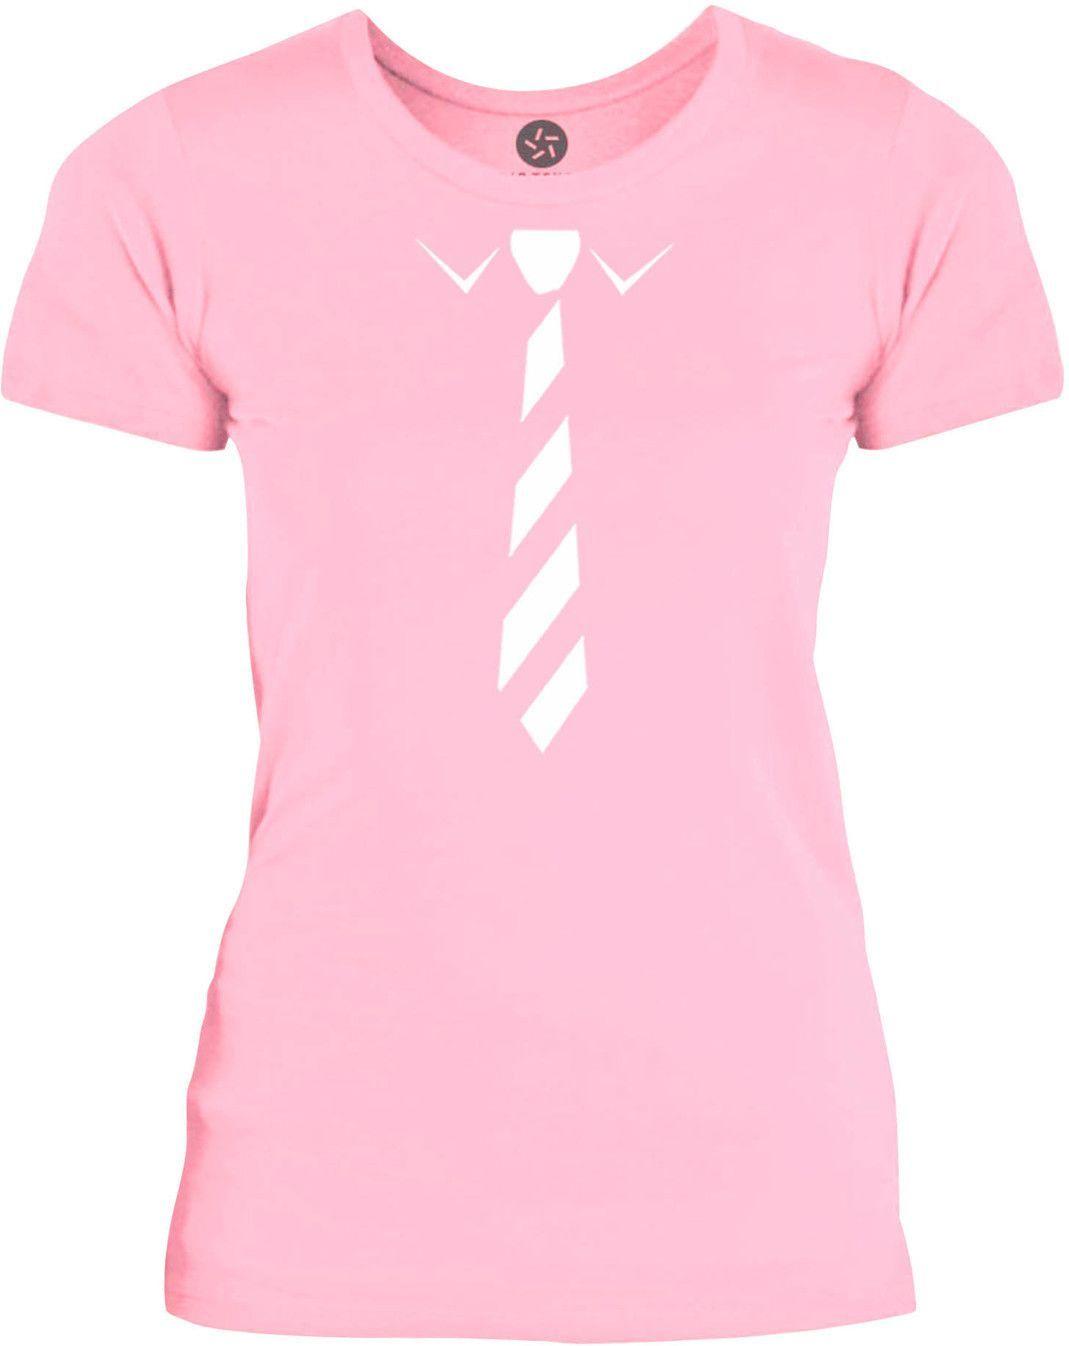 Big Texas Business Tie (White) Womens Fine Jersey T-Shirt